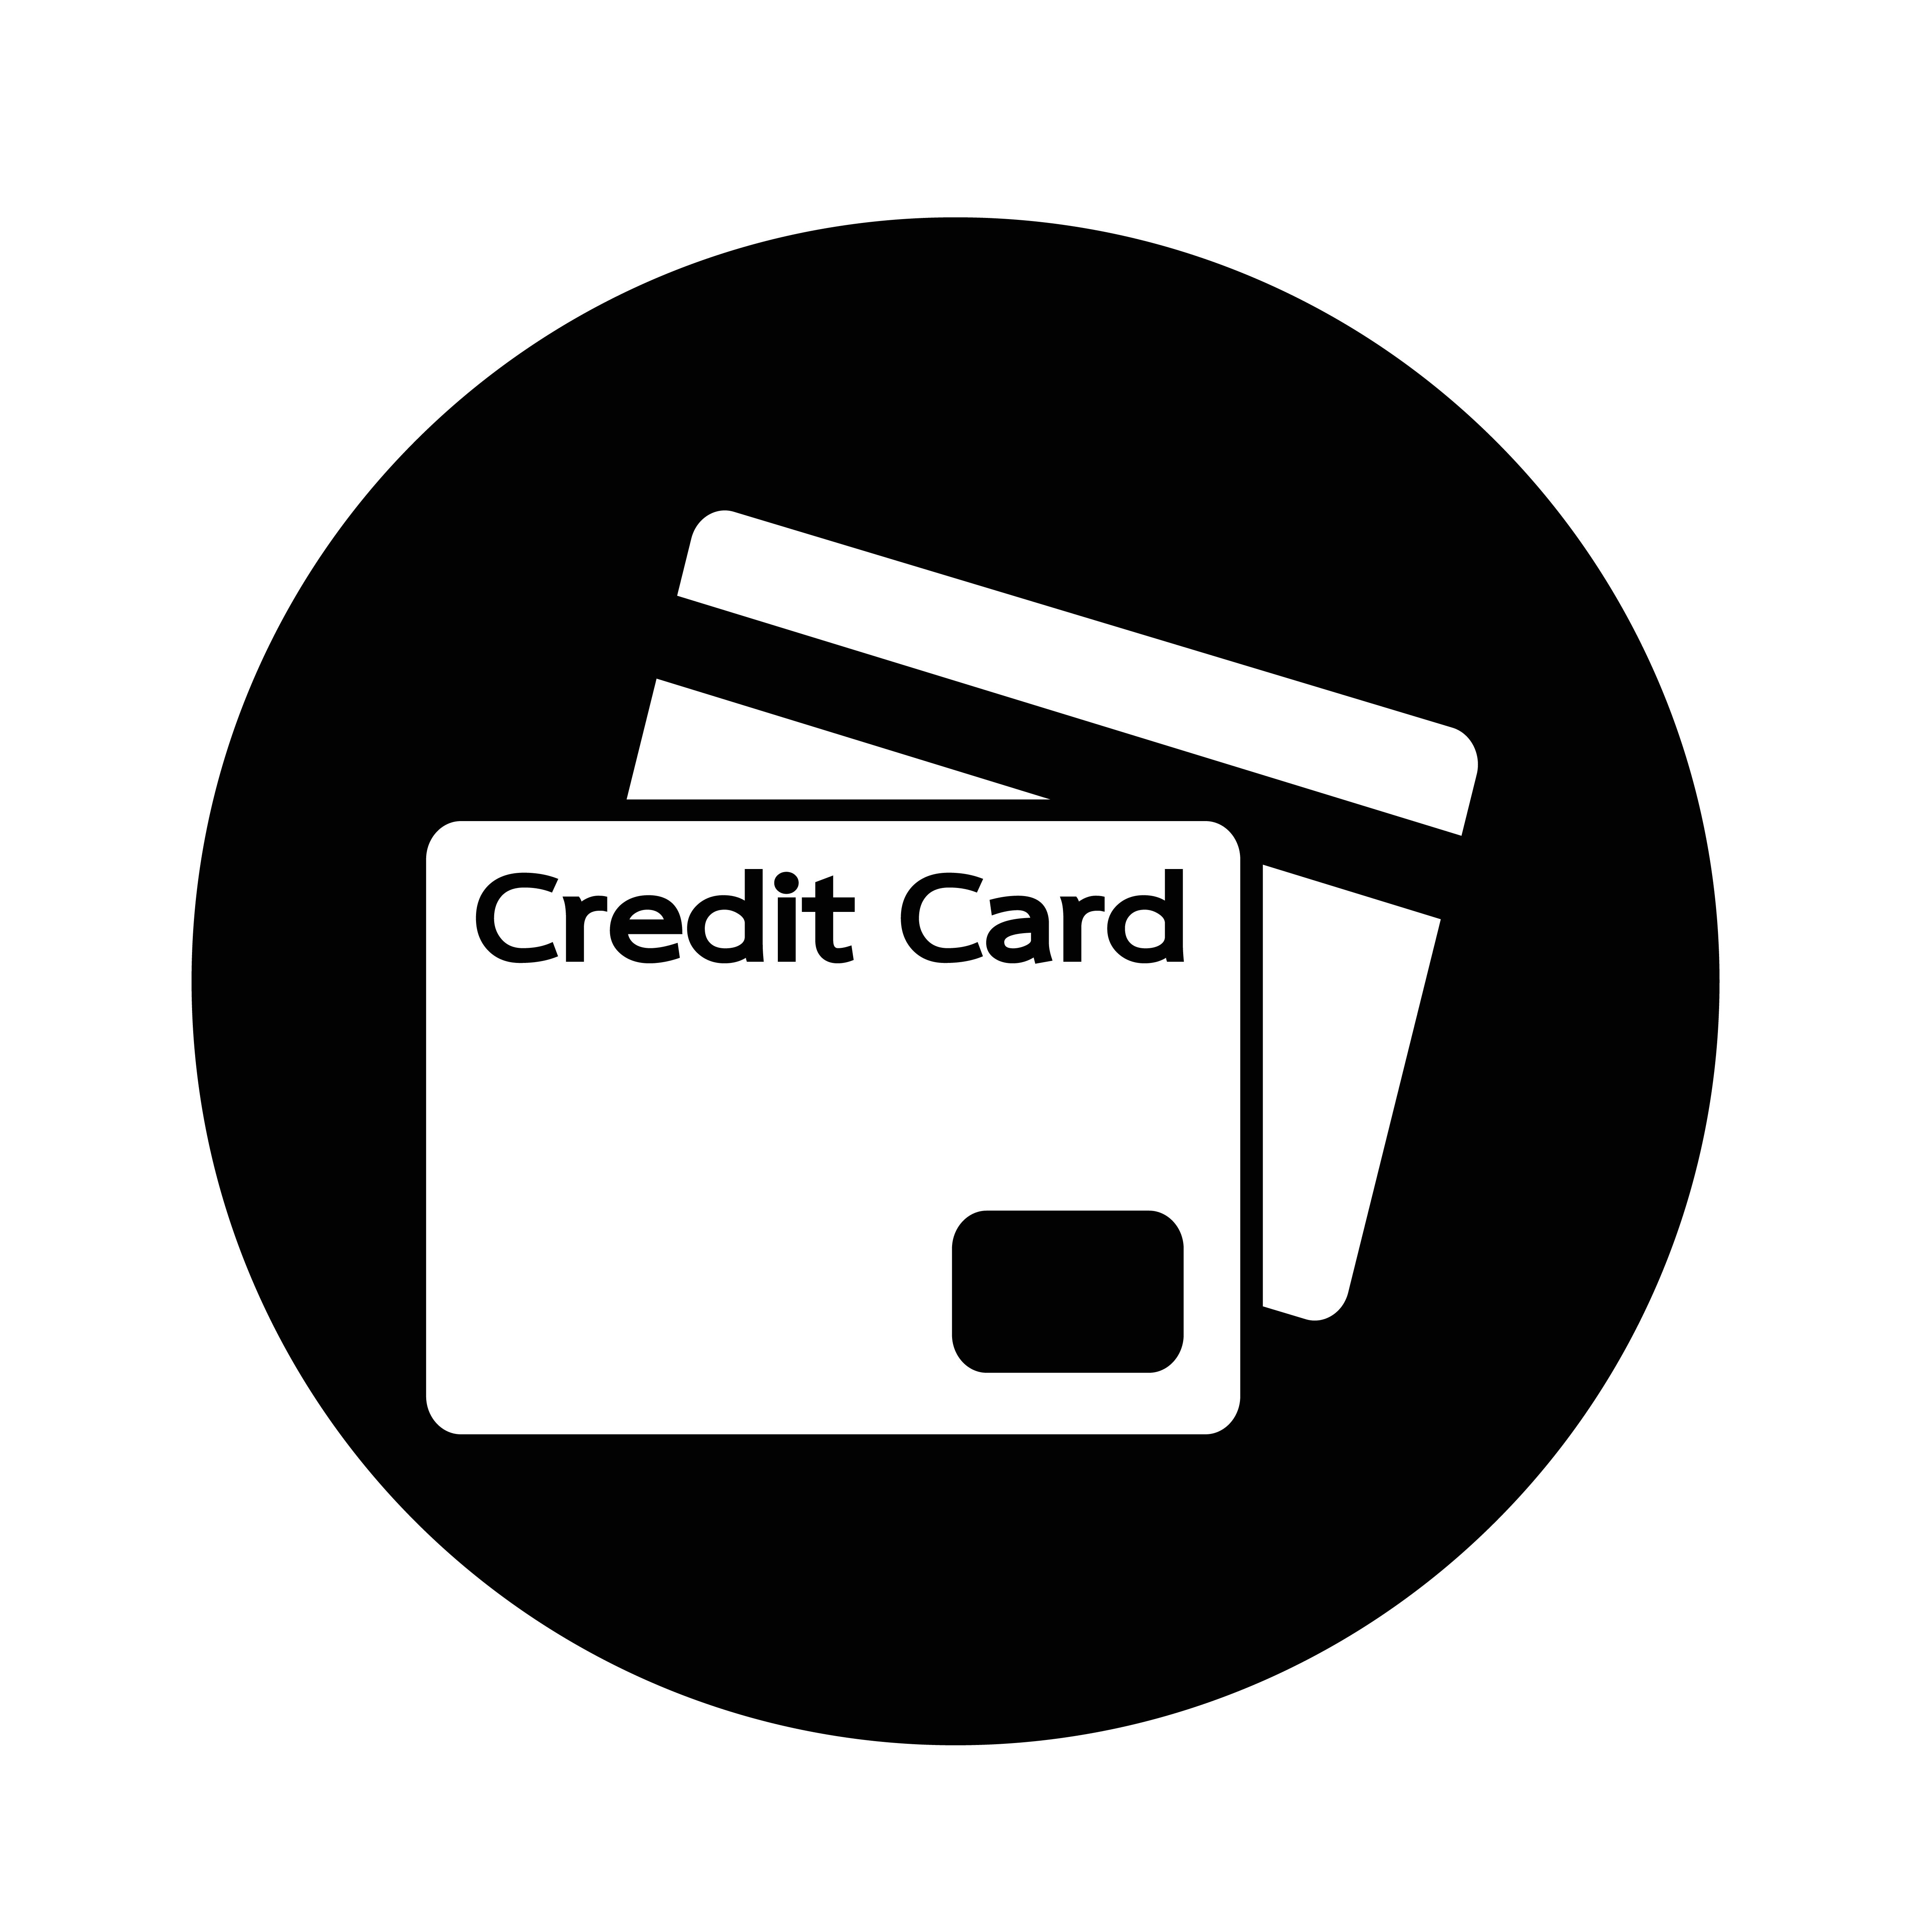 Credit Card Icon 571559 - Download Free Vectors, Clipart Graphics & Vector Art